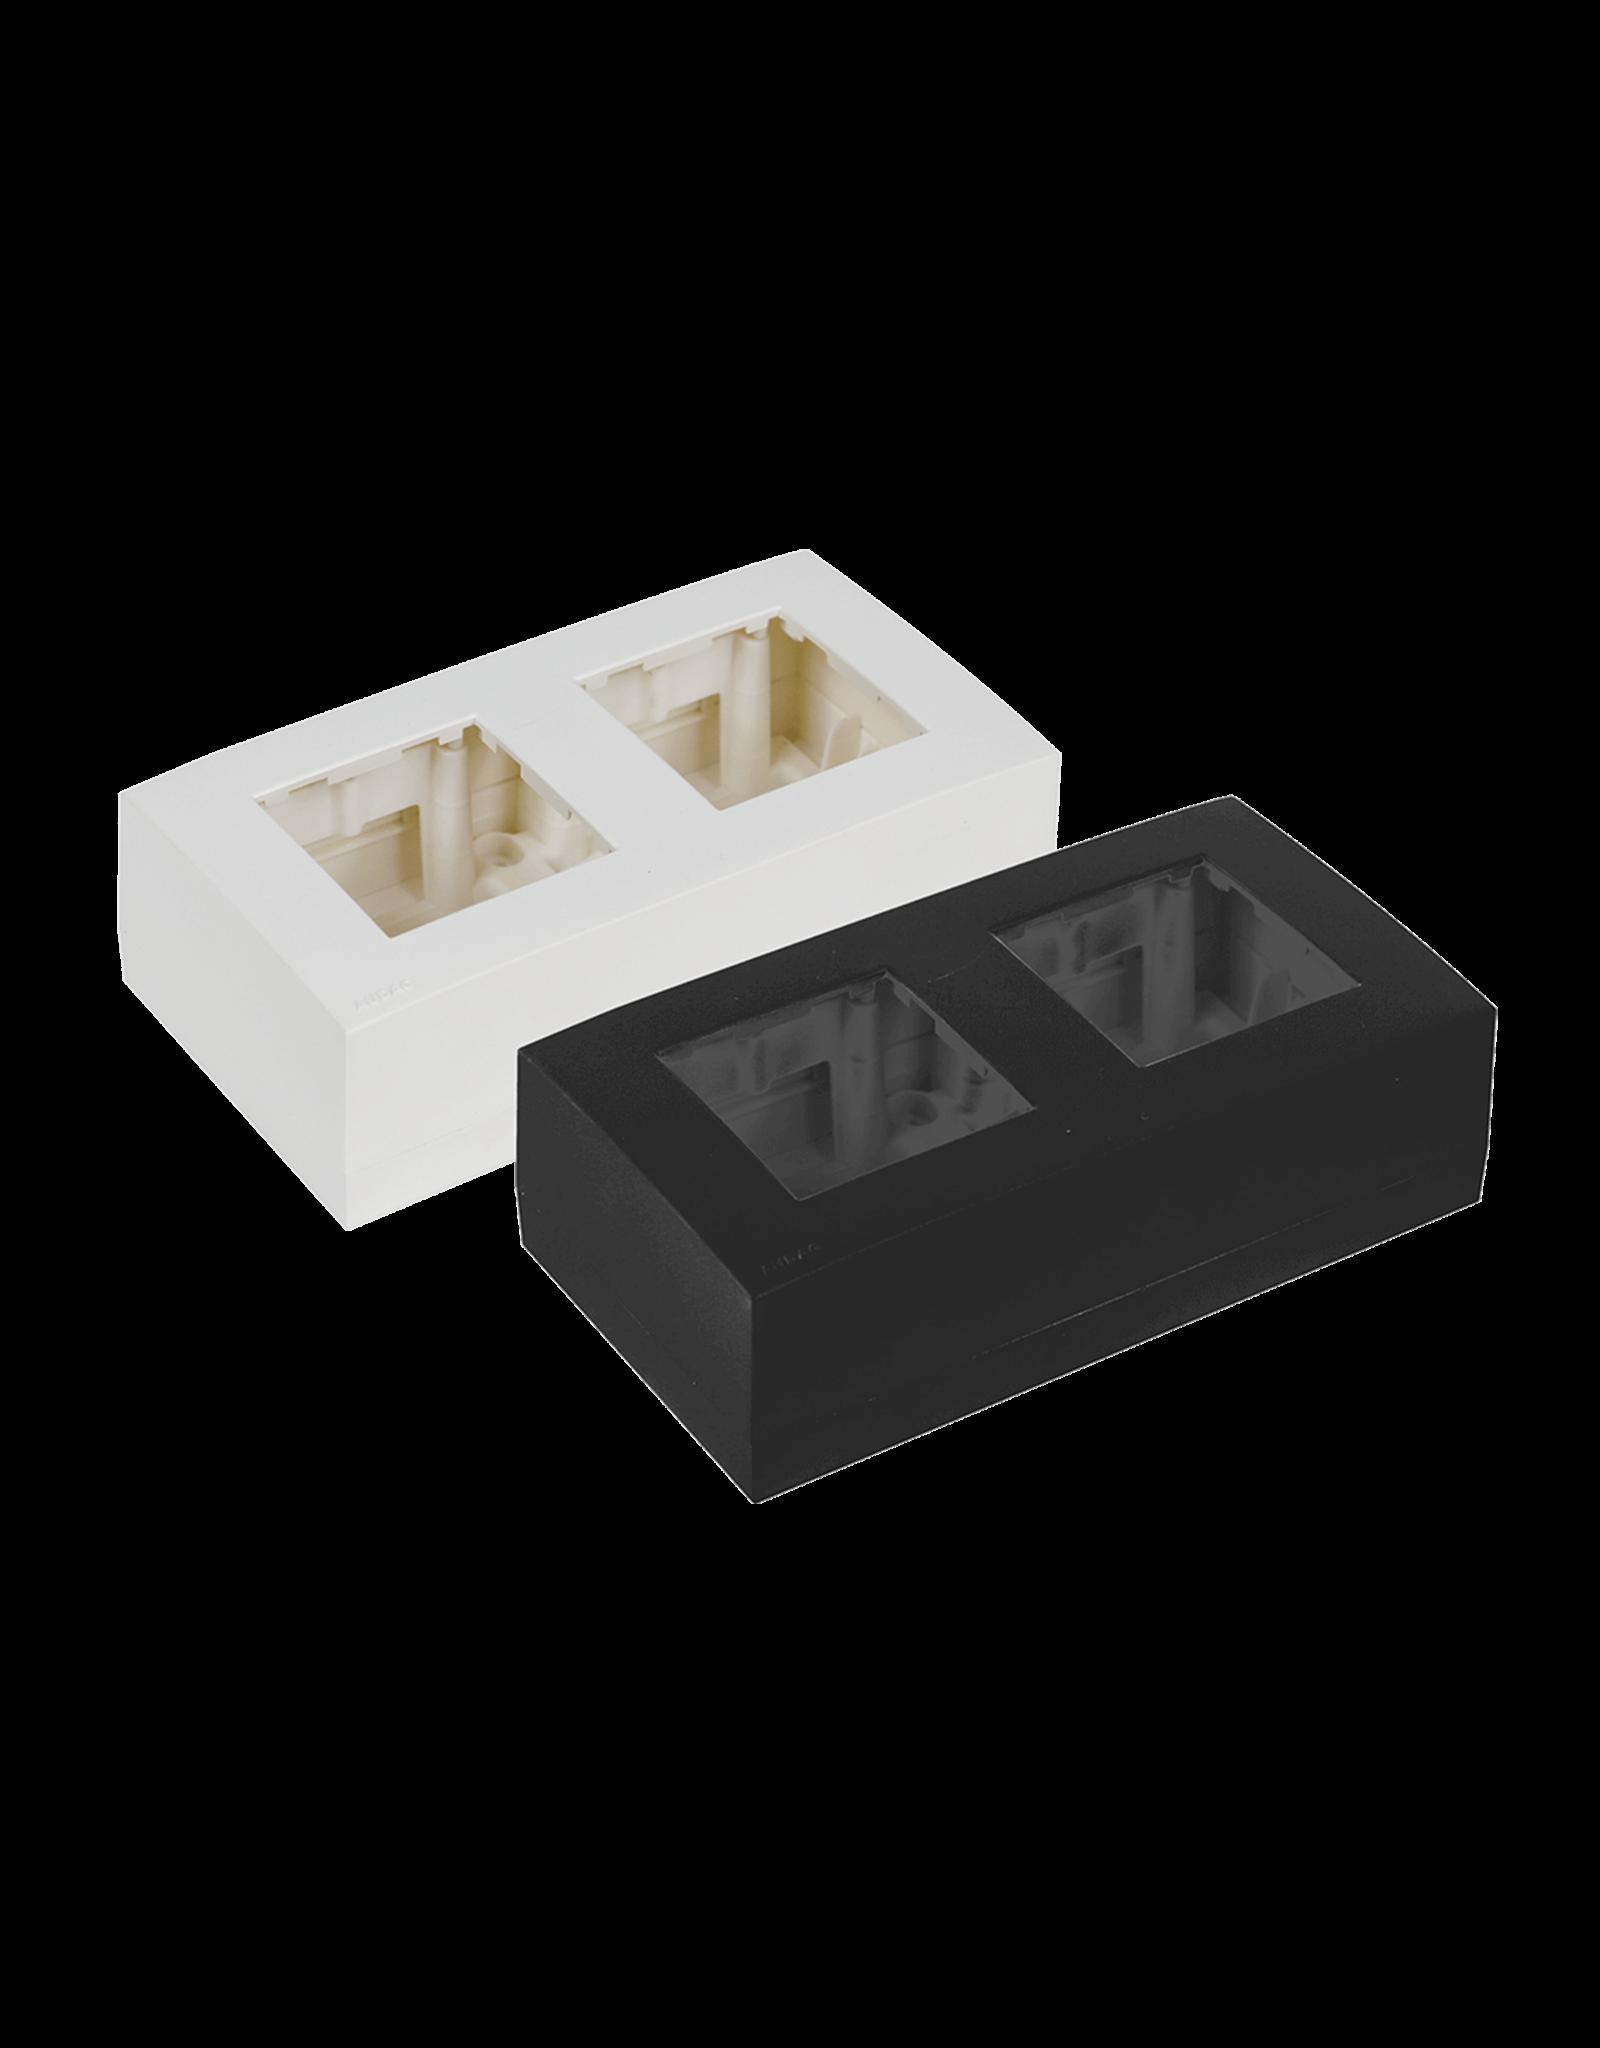 Audac Surface mount box double 45 x 45 mm Black version